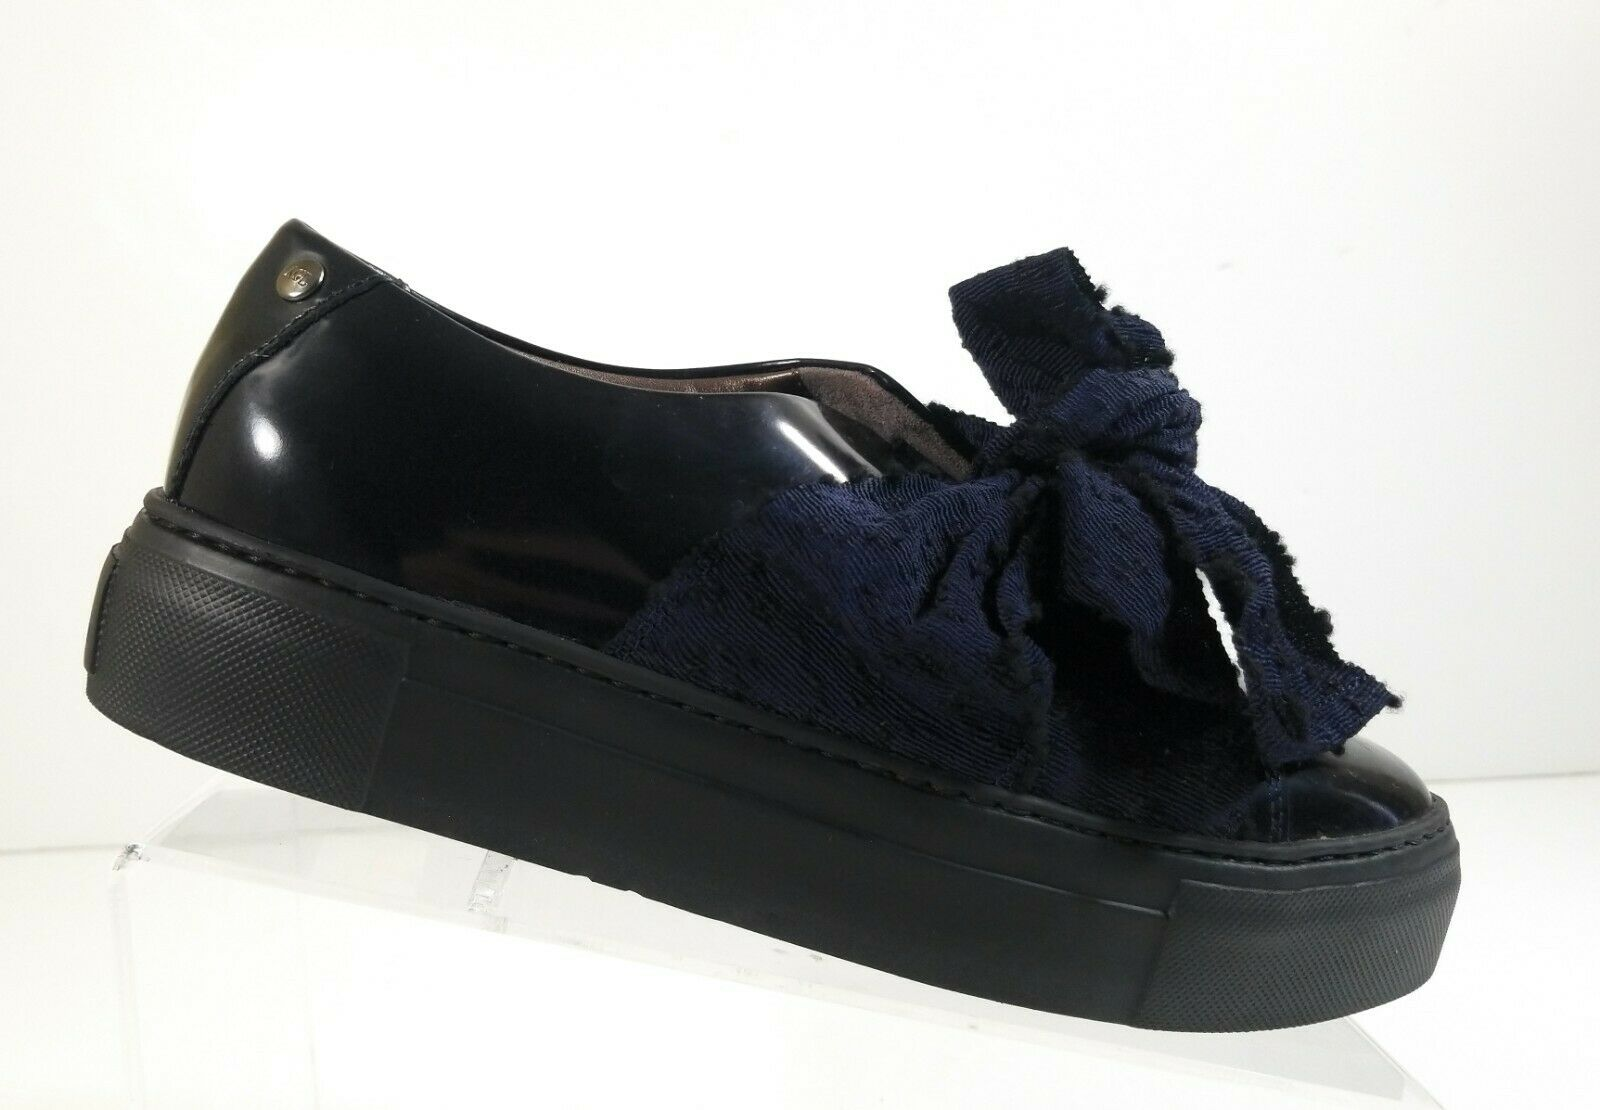 New AGL damen Blau Lace Up Fashion Patent Leather Platform Bow Turnschuhe Sz 38.5